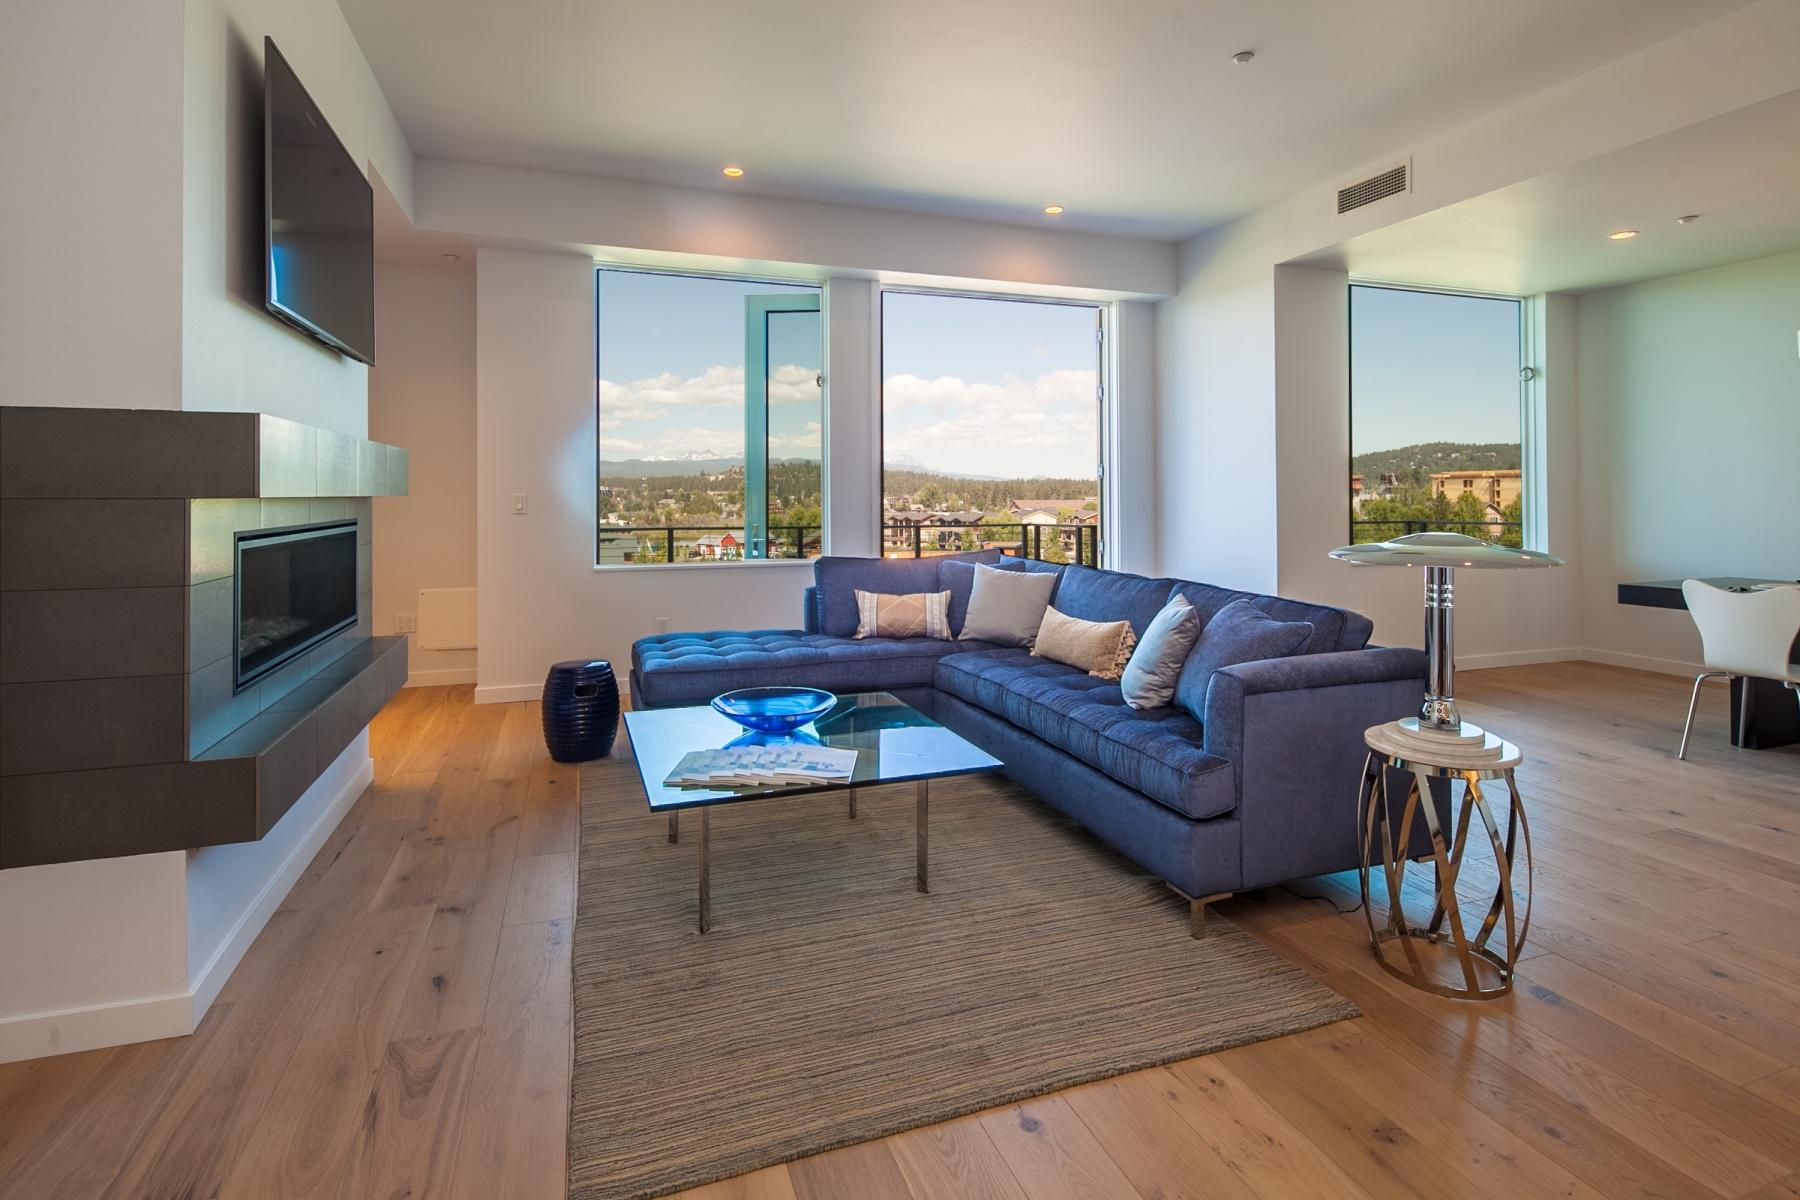 sales property at Luxury Condominium Living in Bend!